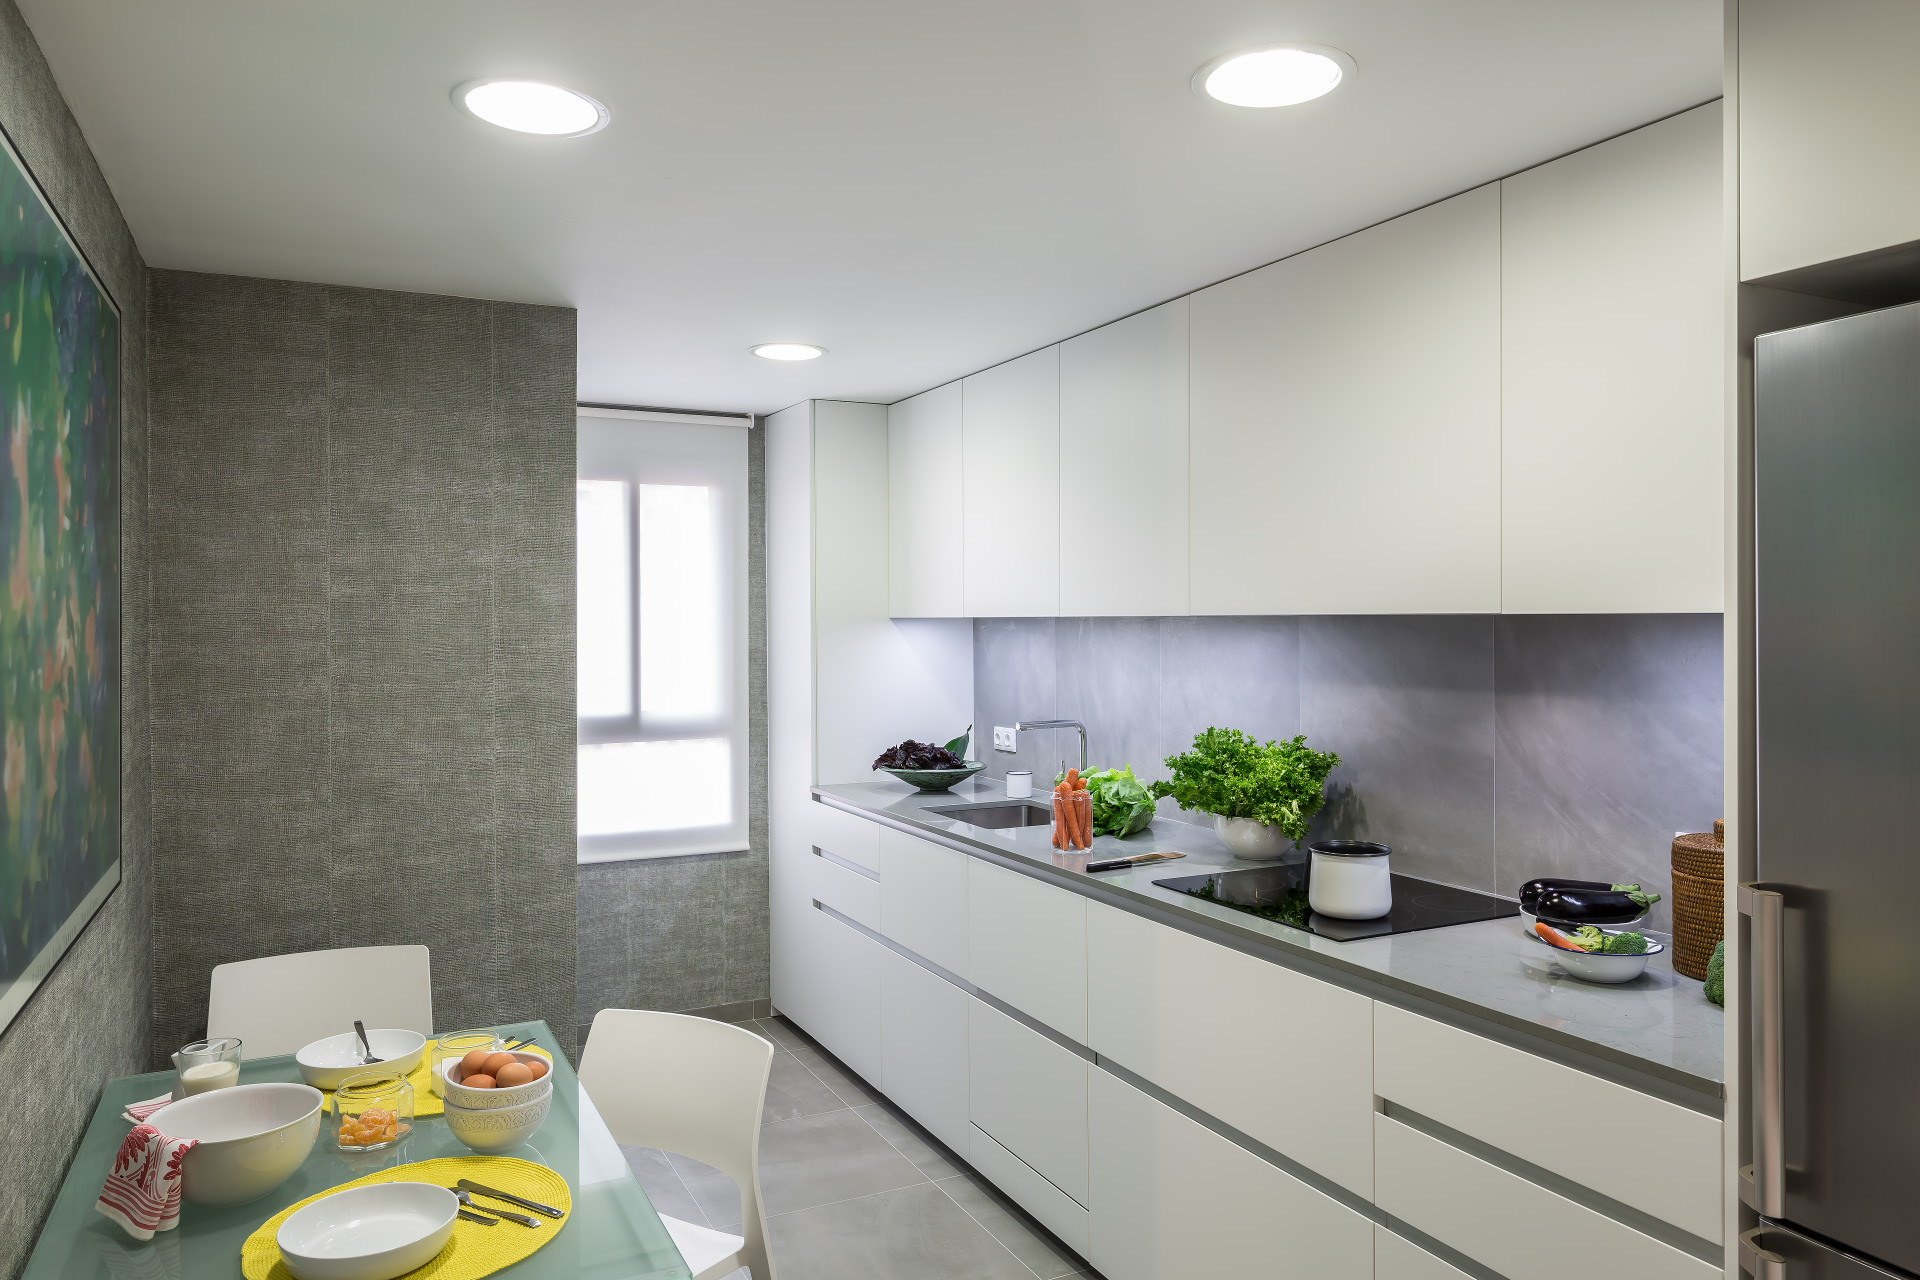 fotografia-arquitectura-interiorismo-valencia-german-cabo-laura-yerpes-mandas (15)